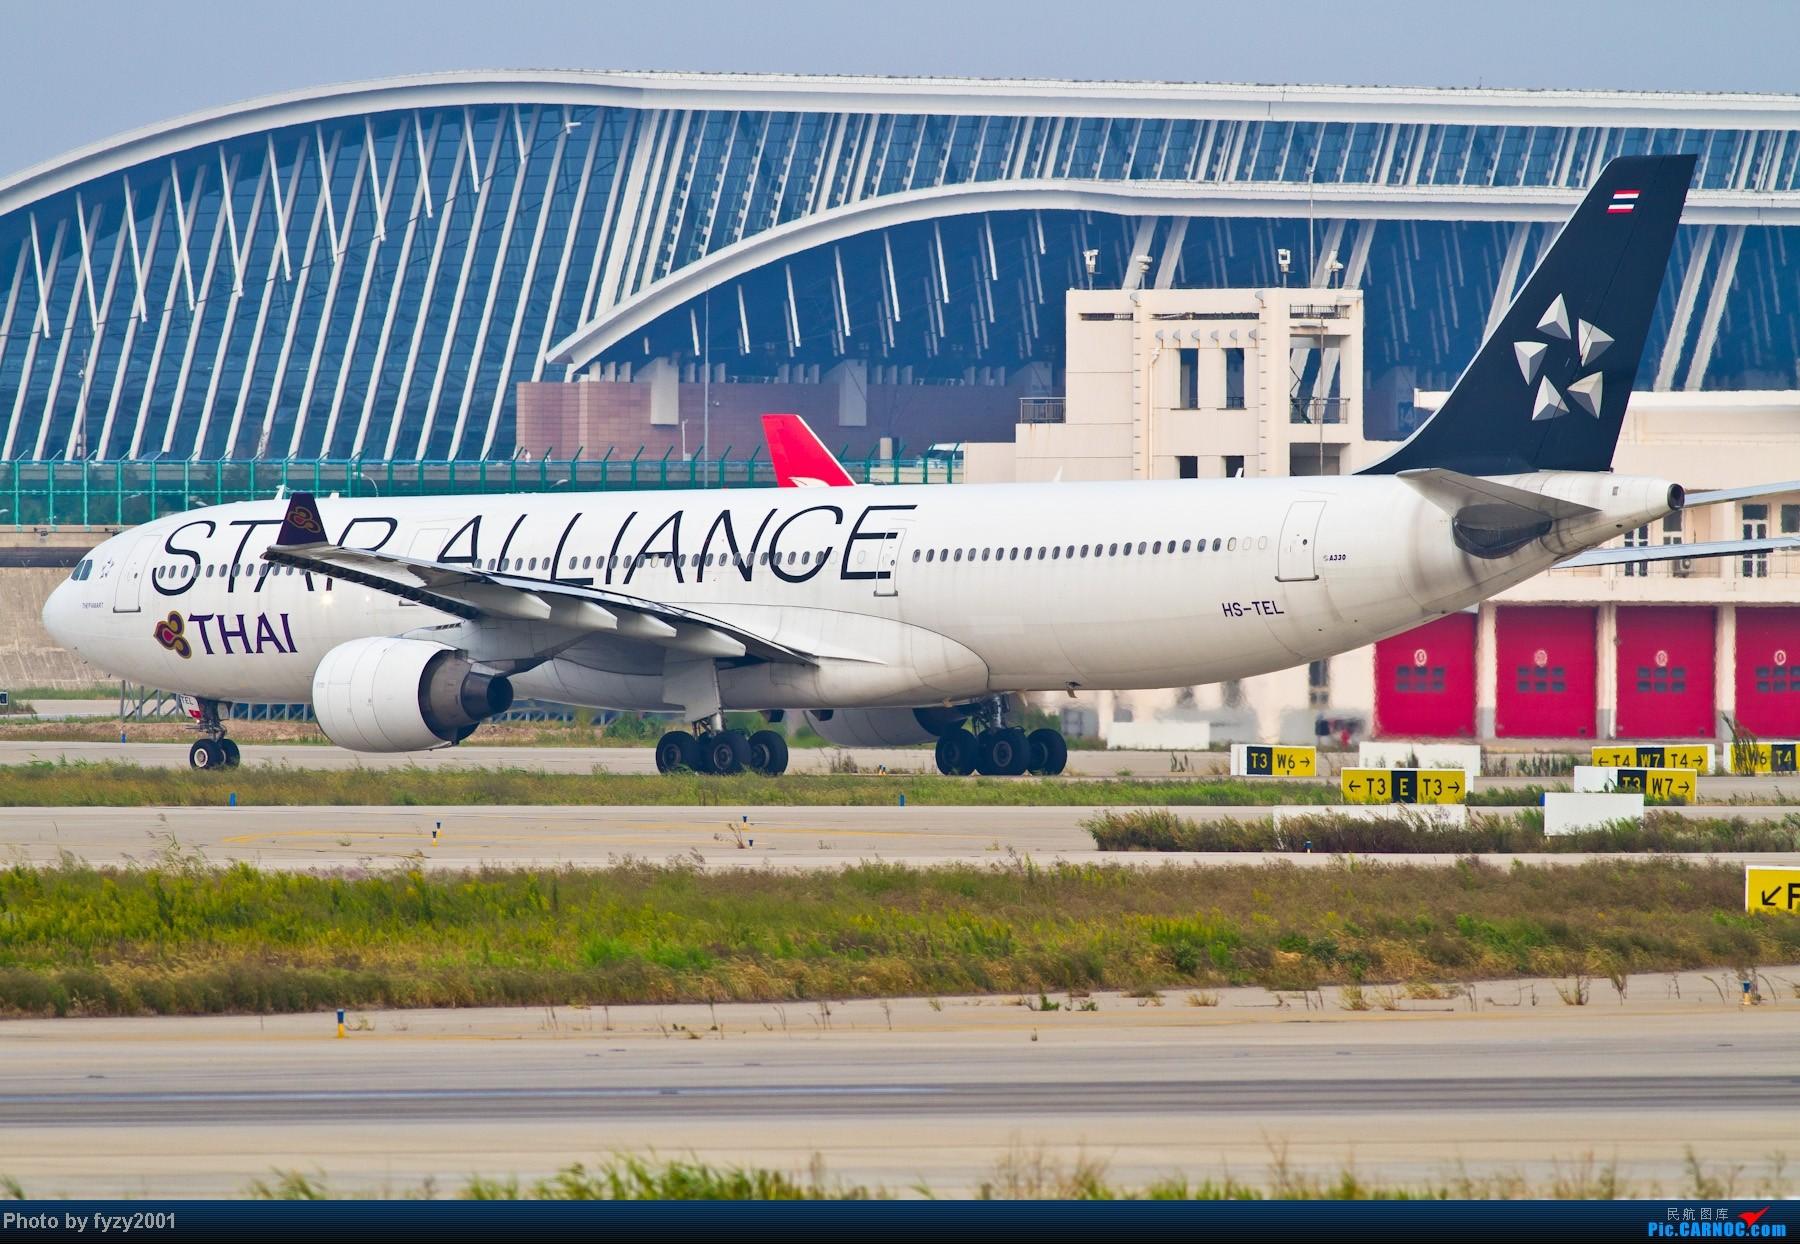 Re:[原创][无锡西站]长假PVG蹲守~~~~只发大图,多图杀猫~~~~ AIRBUS A330 HS-TEL 中国上海浦东机场